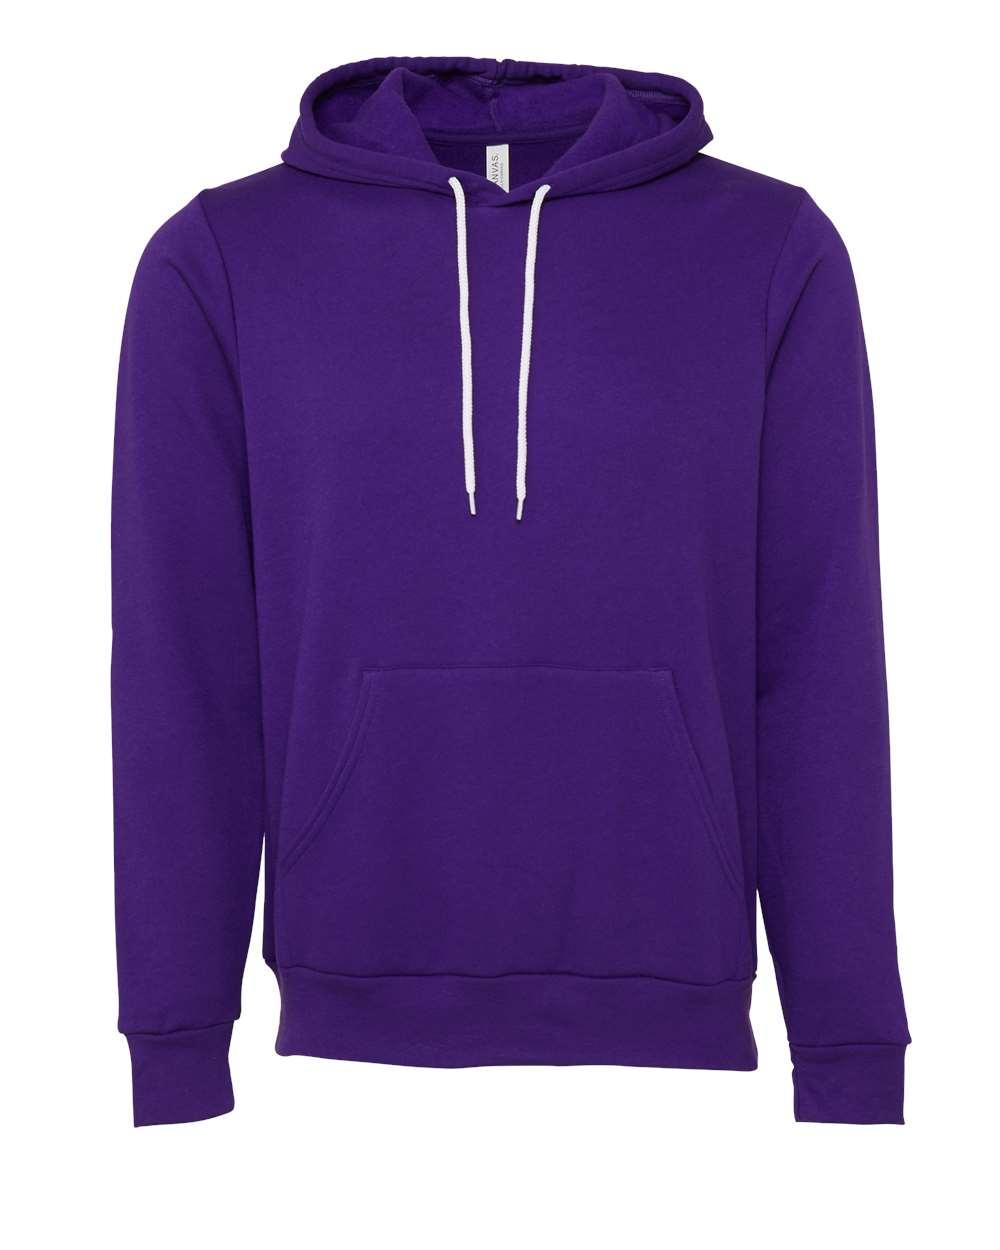 Bella-Canvas-Unisex-Sponge-Hooded-Pullover-Sweatshirt-Blank-3719-up-to-2XL thumbnail 95